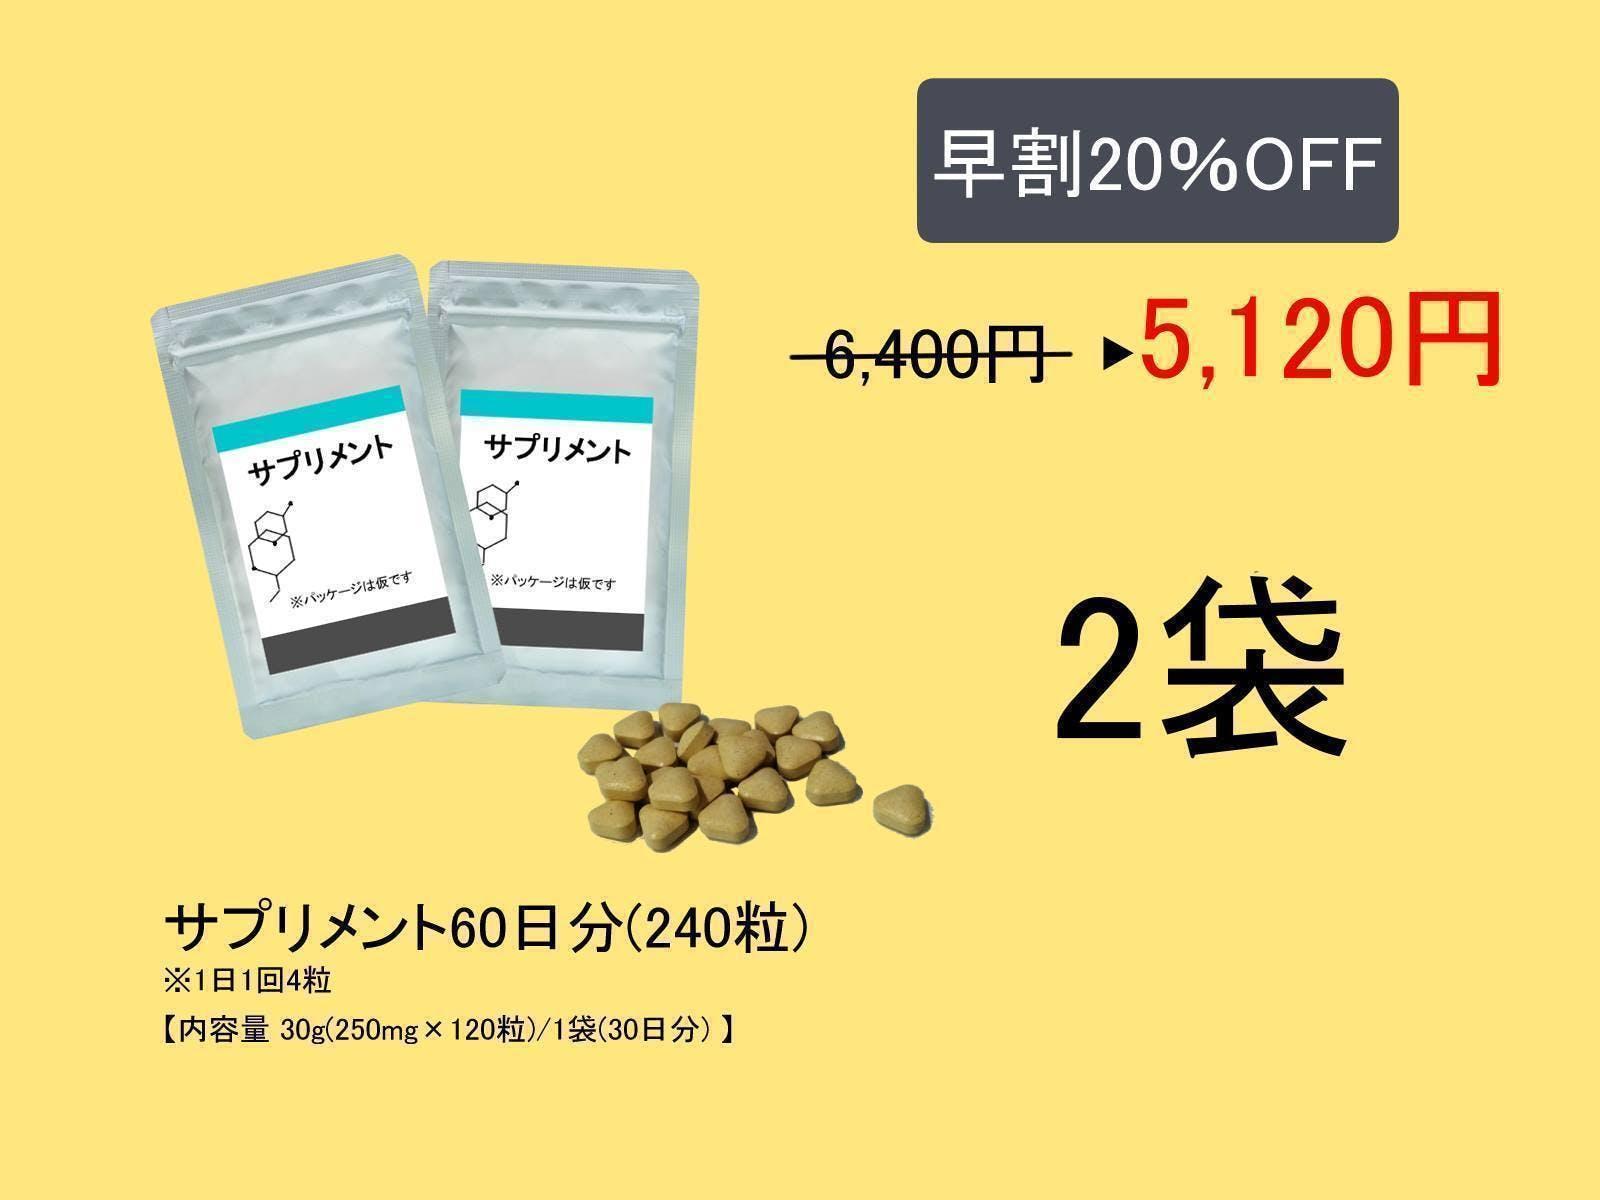 5120円